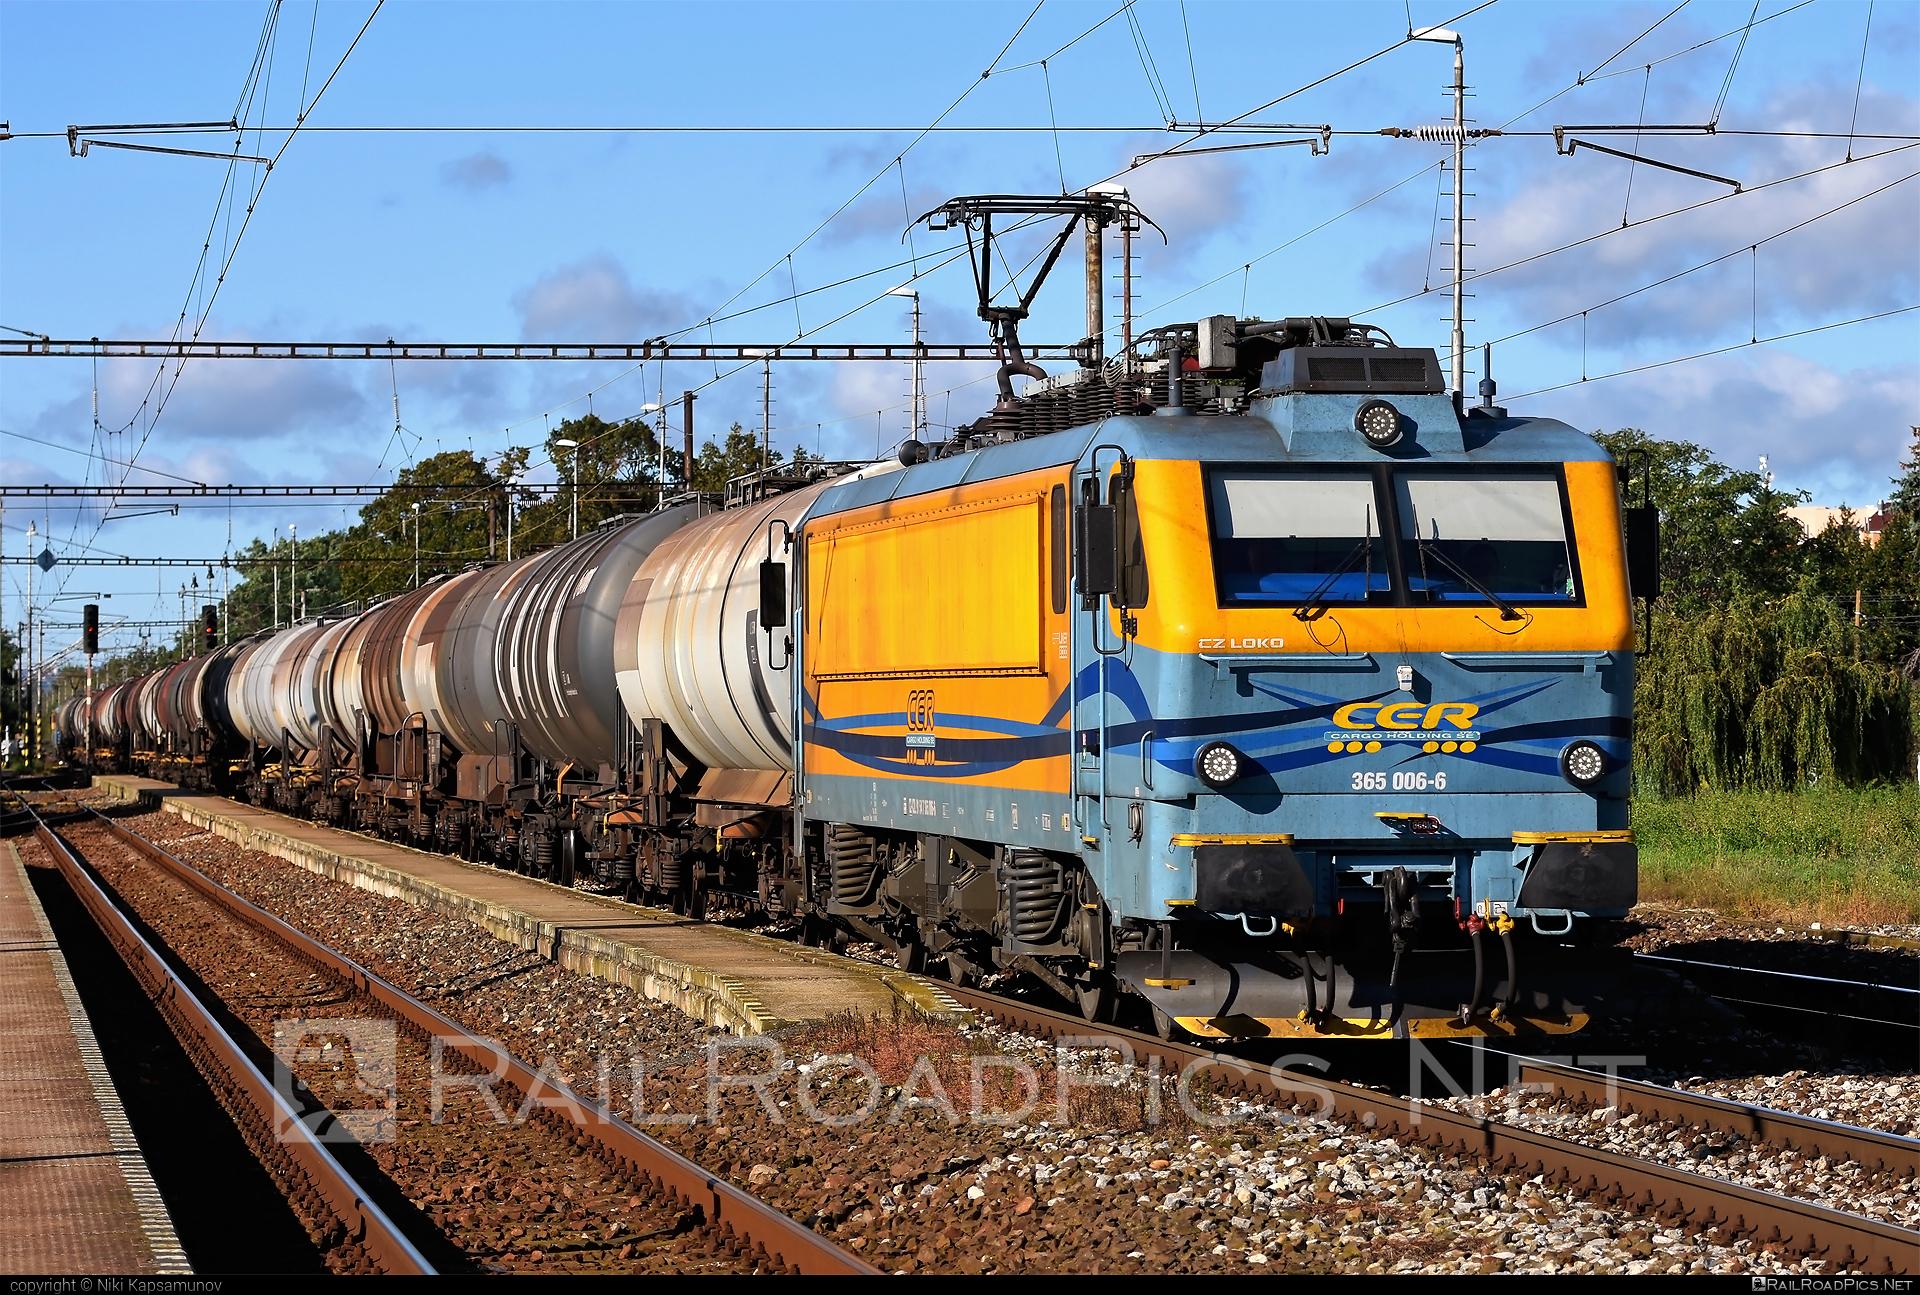 CZ LOKO EffiLiner 3000 - 365 006-6 operated by CER Slovakia a.s. #belgicanka #cer #cersk #cerslovakia #cerslovakiaas #czloko #czlokoas #effiliner #effiliner3000 #kesselwagen #sncb12 #sncbclass12 #tankwagon